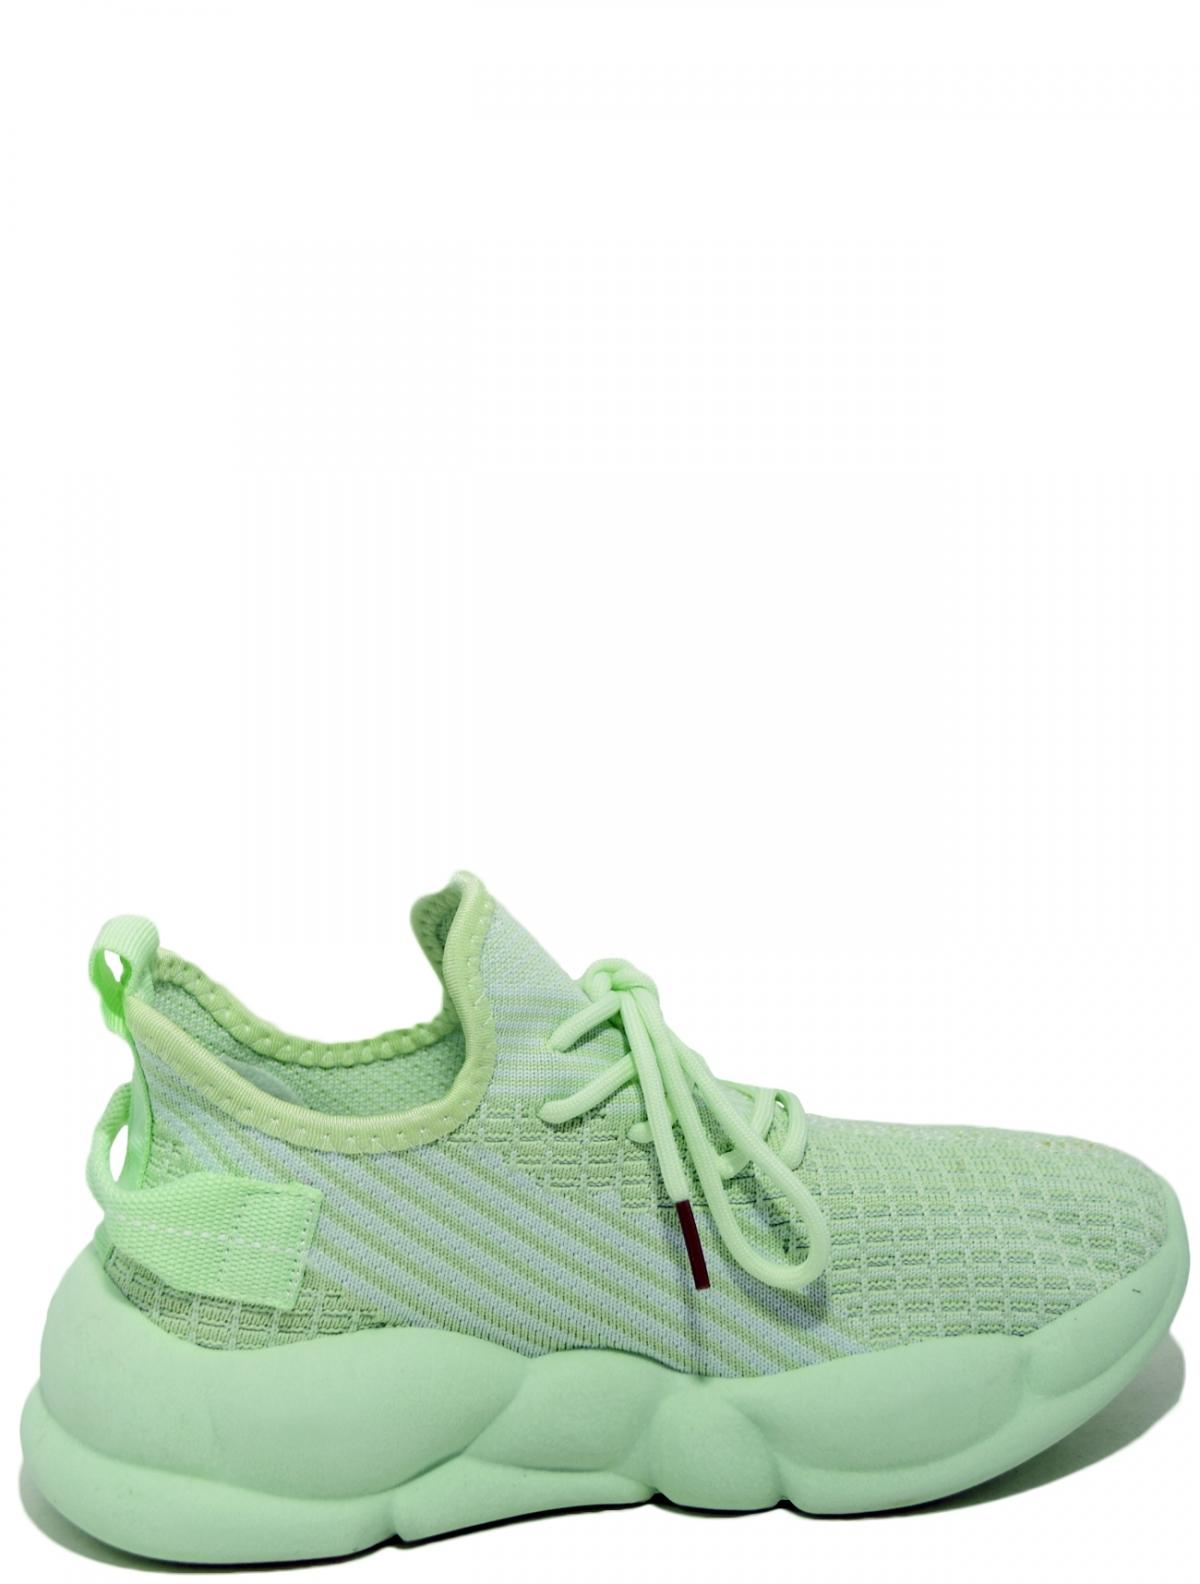 Fashion A06-17 женские кроссовки